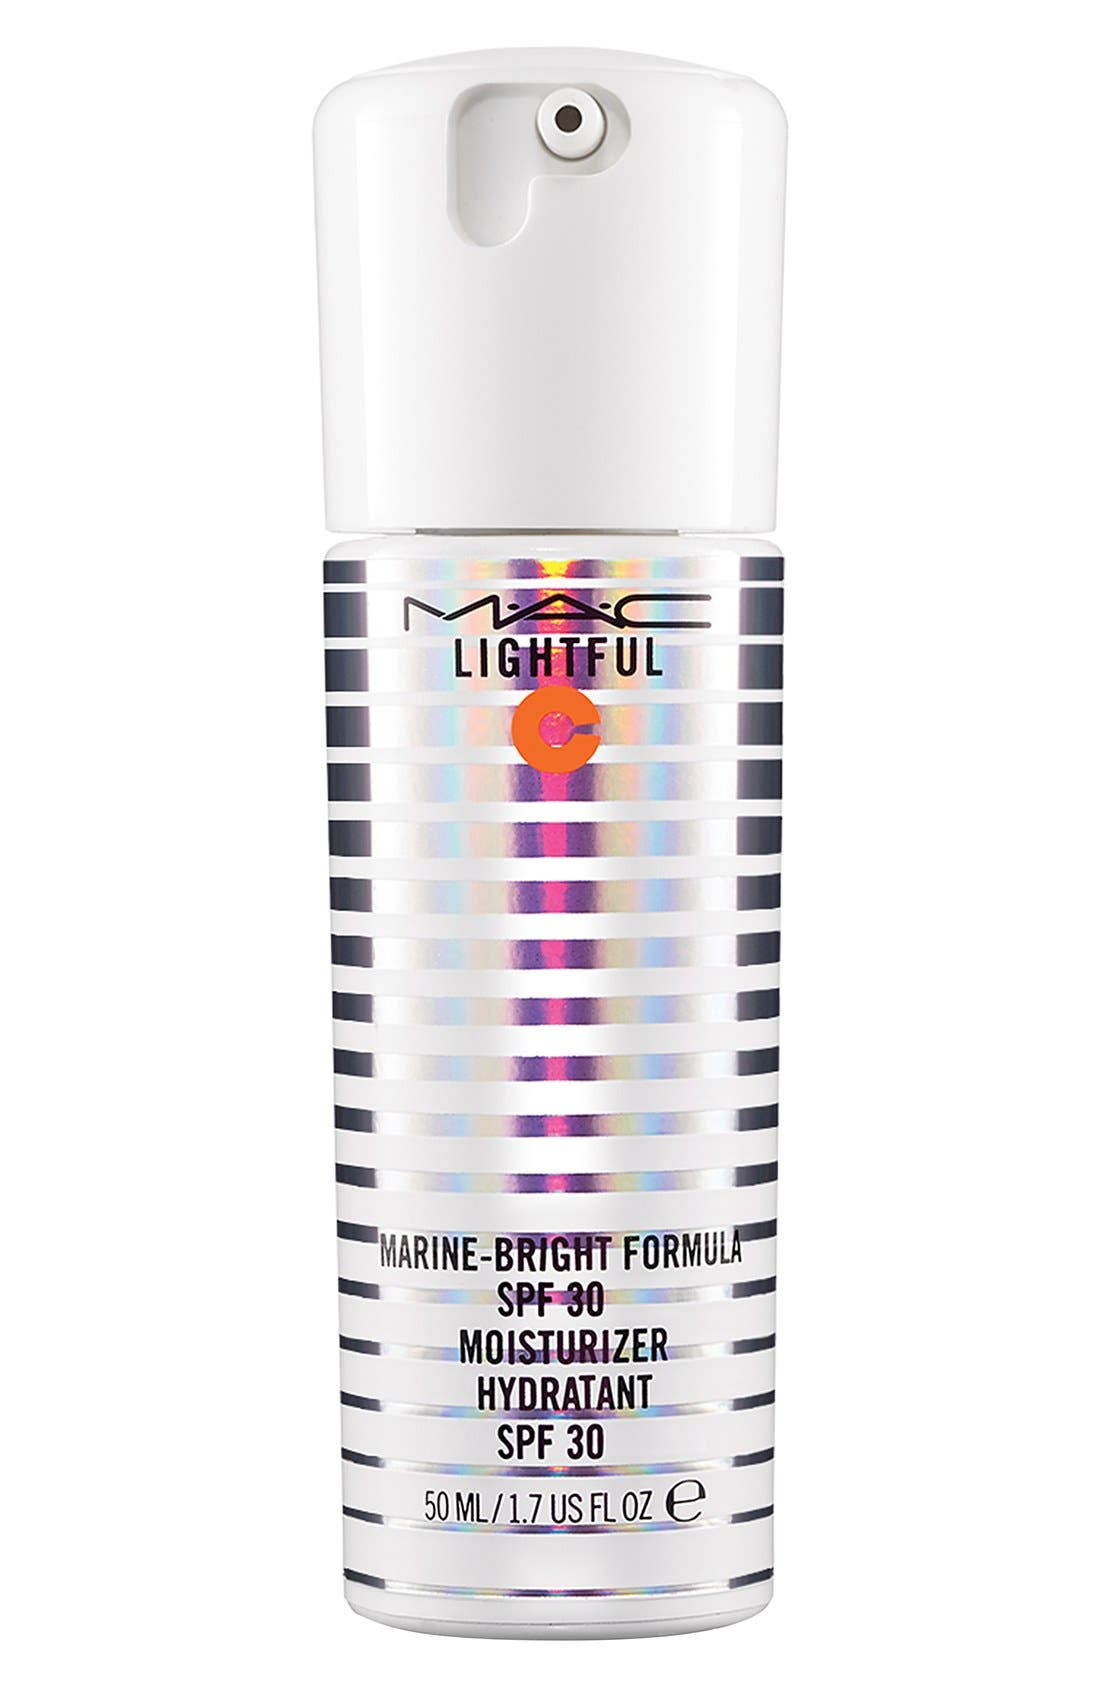 MAC 'Lightful C' Marine-Bright Formula SPF 30 Moisturizer